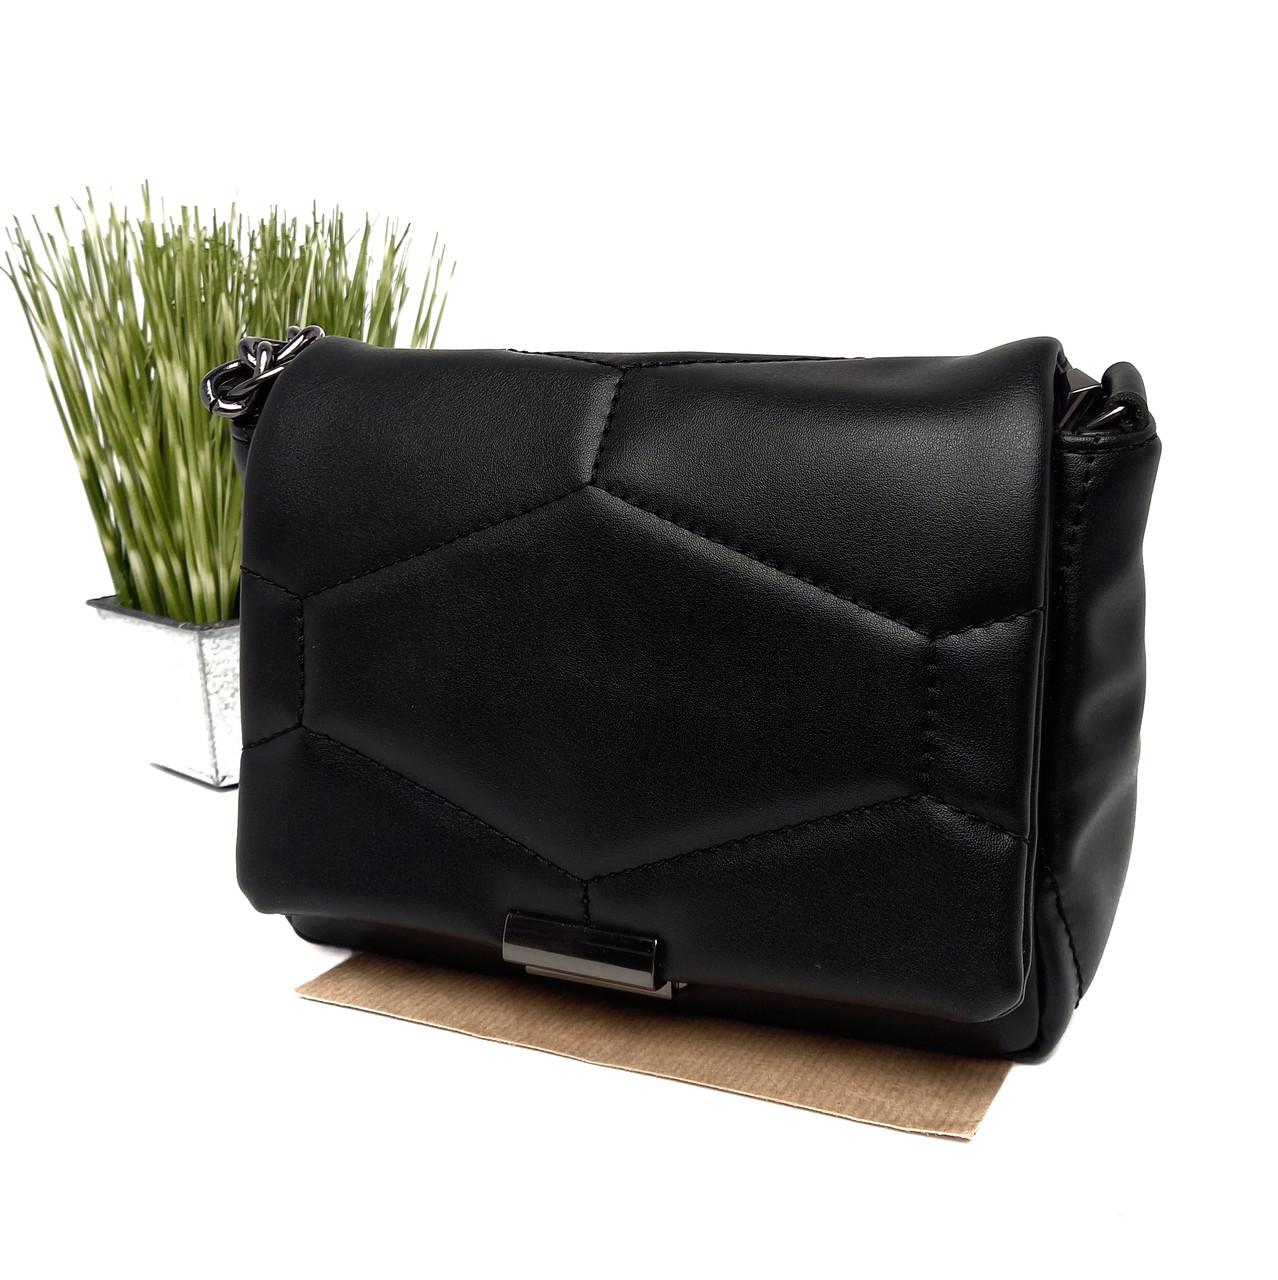 Маленька жіноча сумка штучна шкіра чорний Арт.90504 WeLassie (Україна)